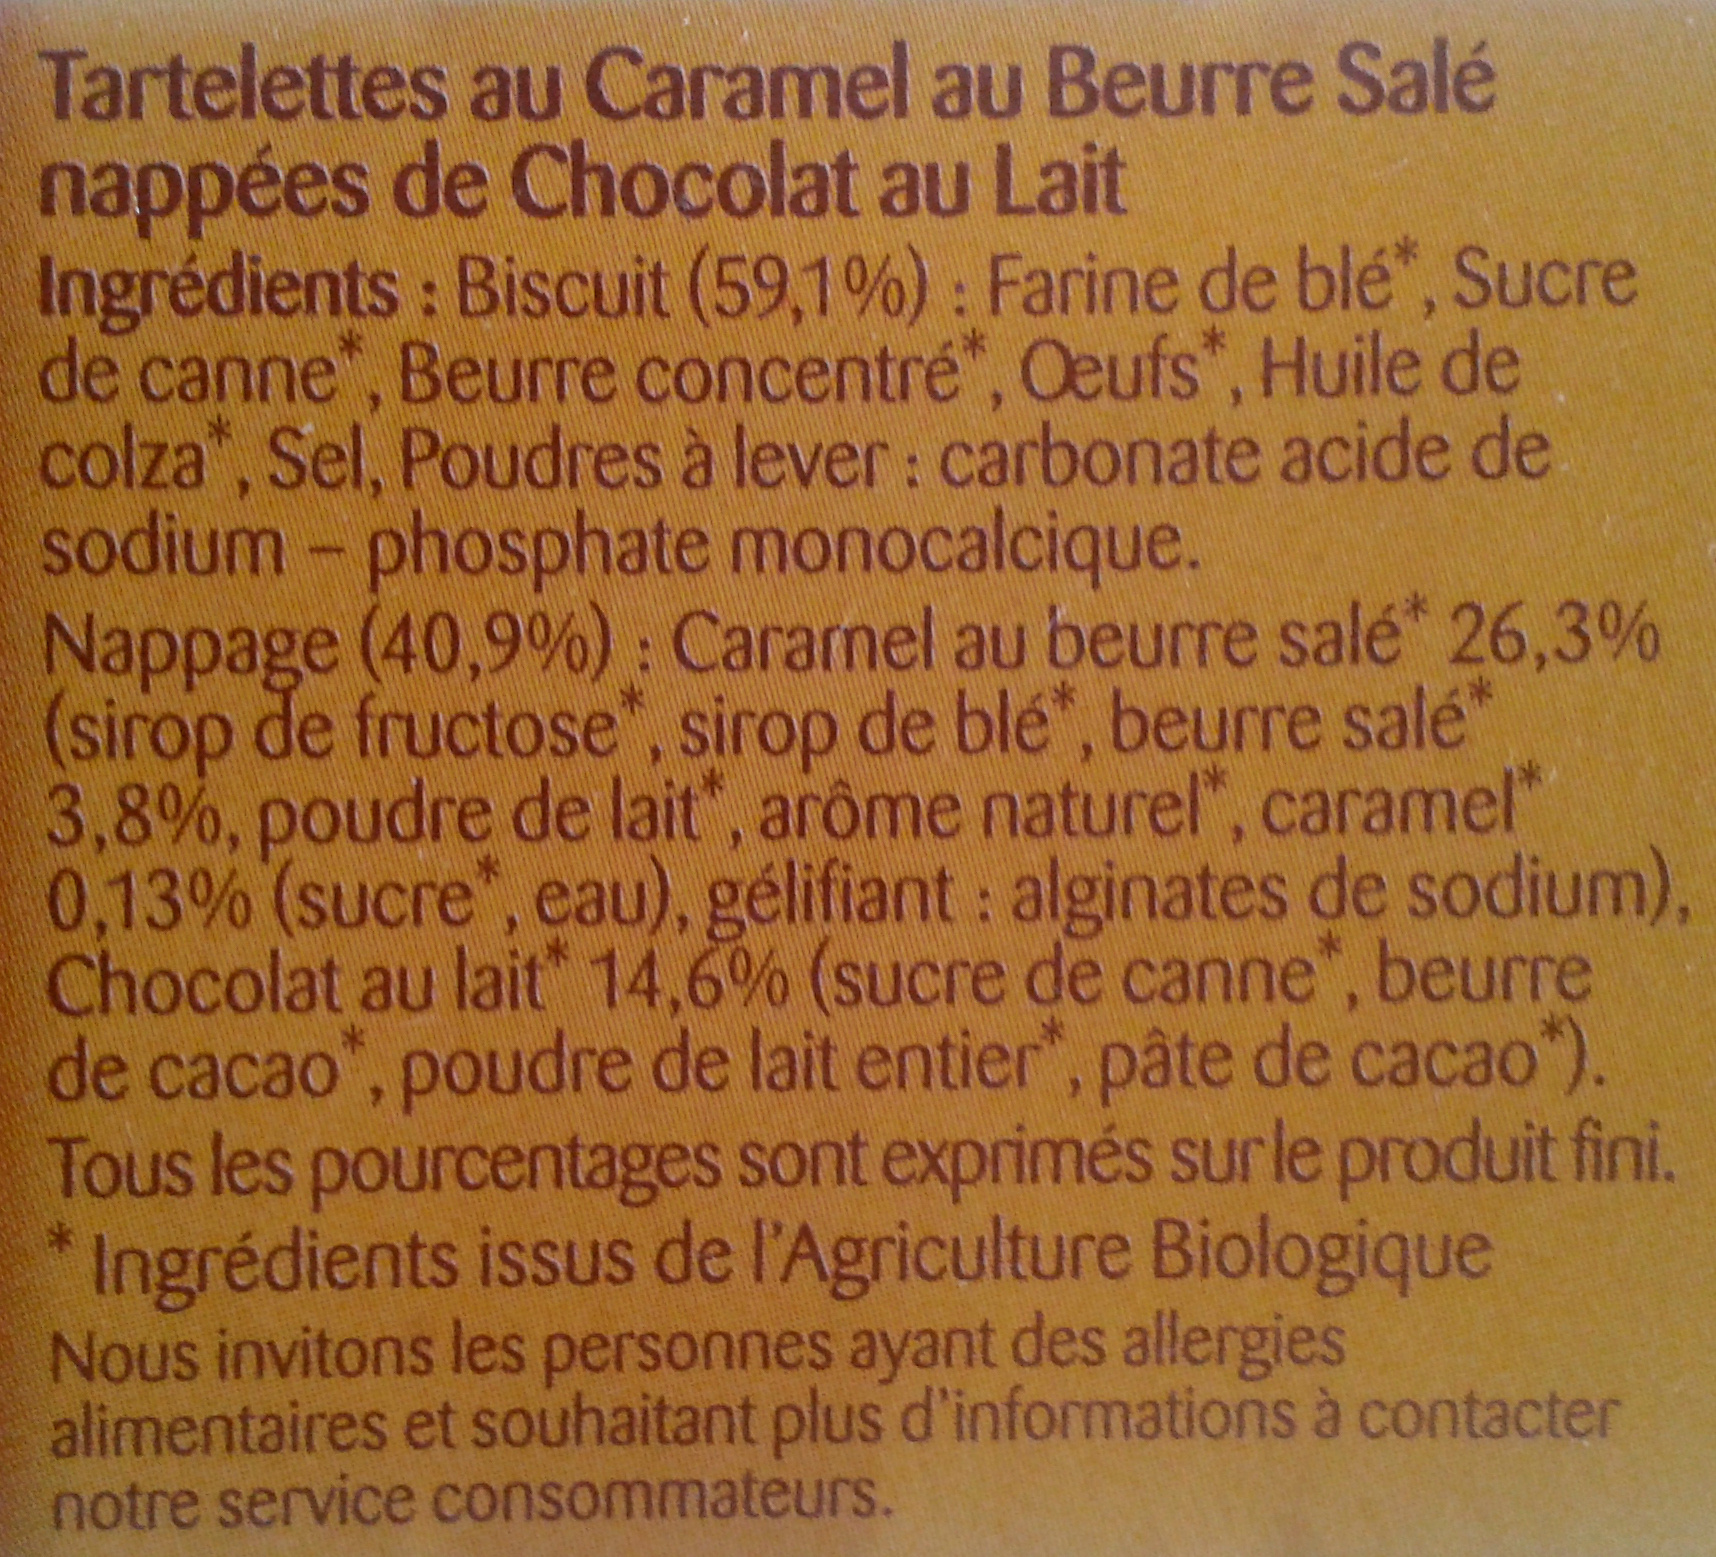 Tartelettes au caramel et chocolat au lait - Ingrediënten